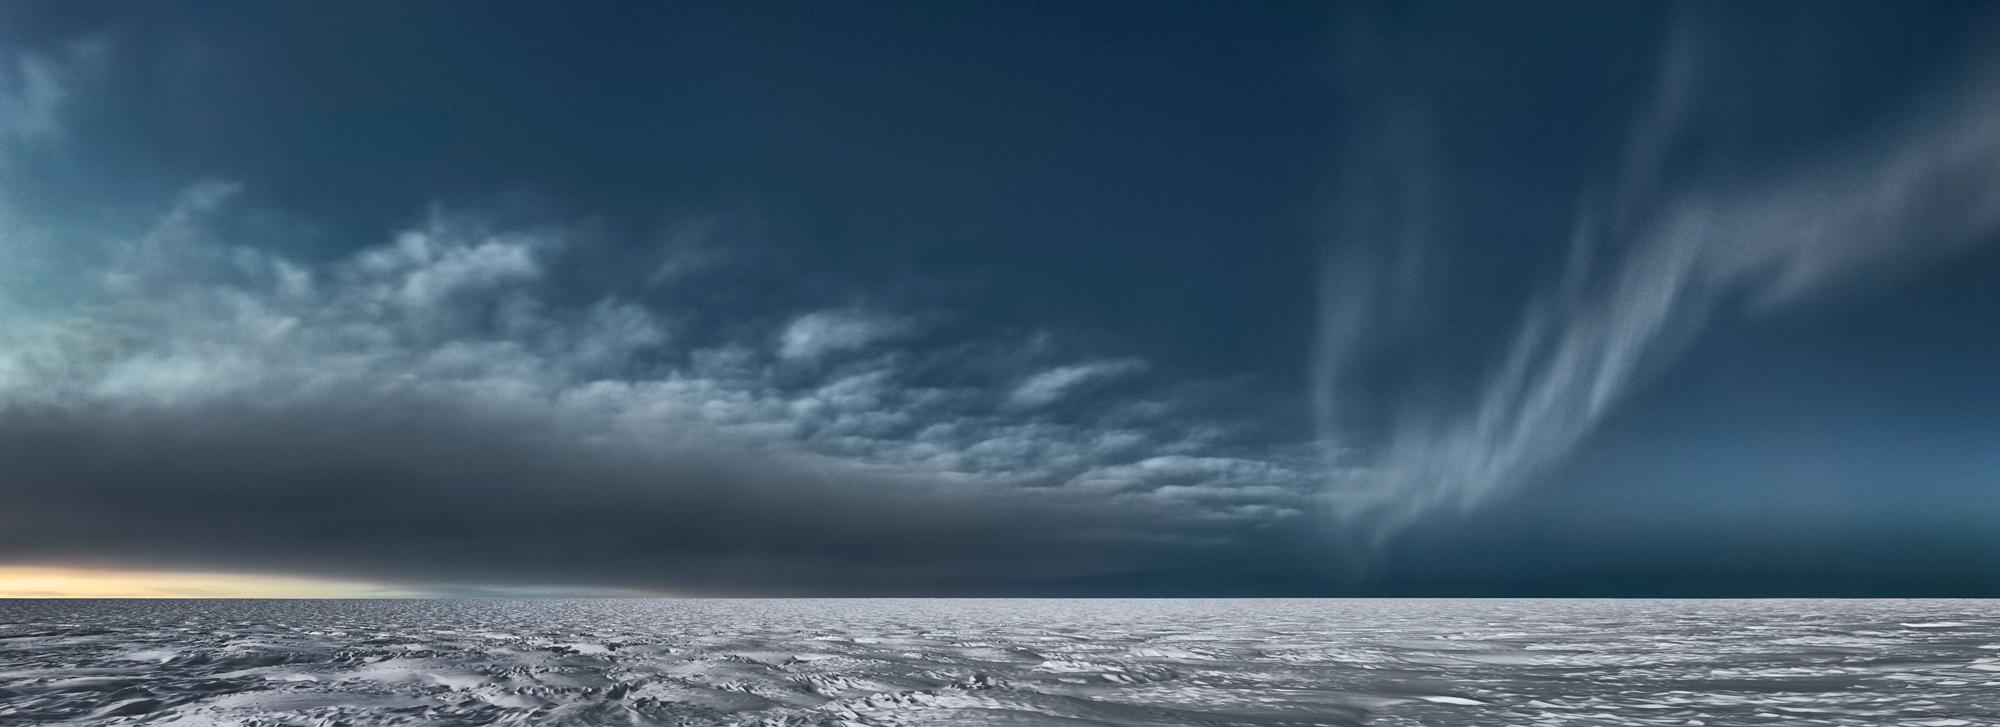 Icesheet #3373 cloud bank & aurora, 95cm x 261cm, Digital Pigment Print, Edition of 7, 2013